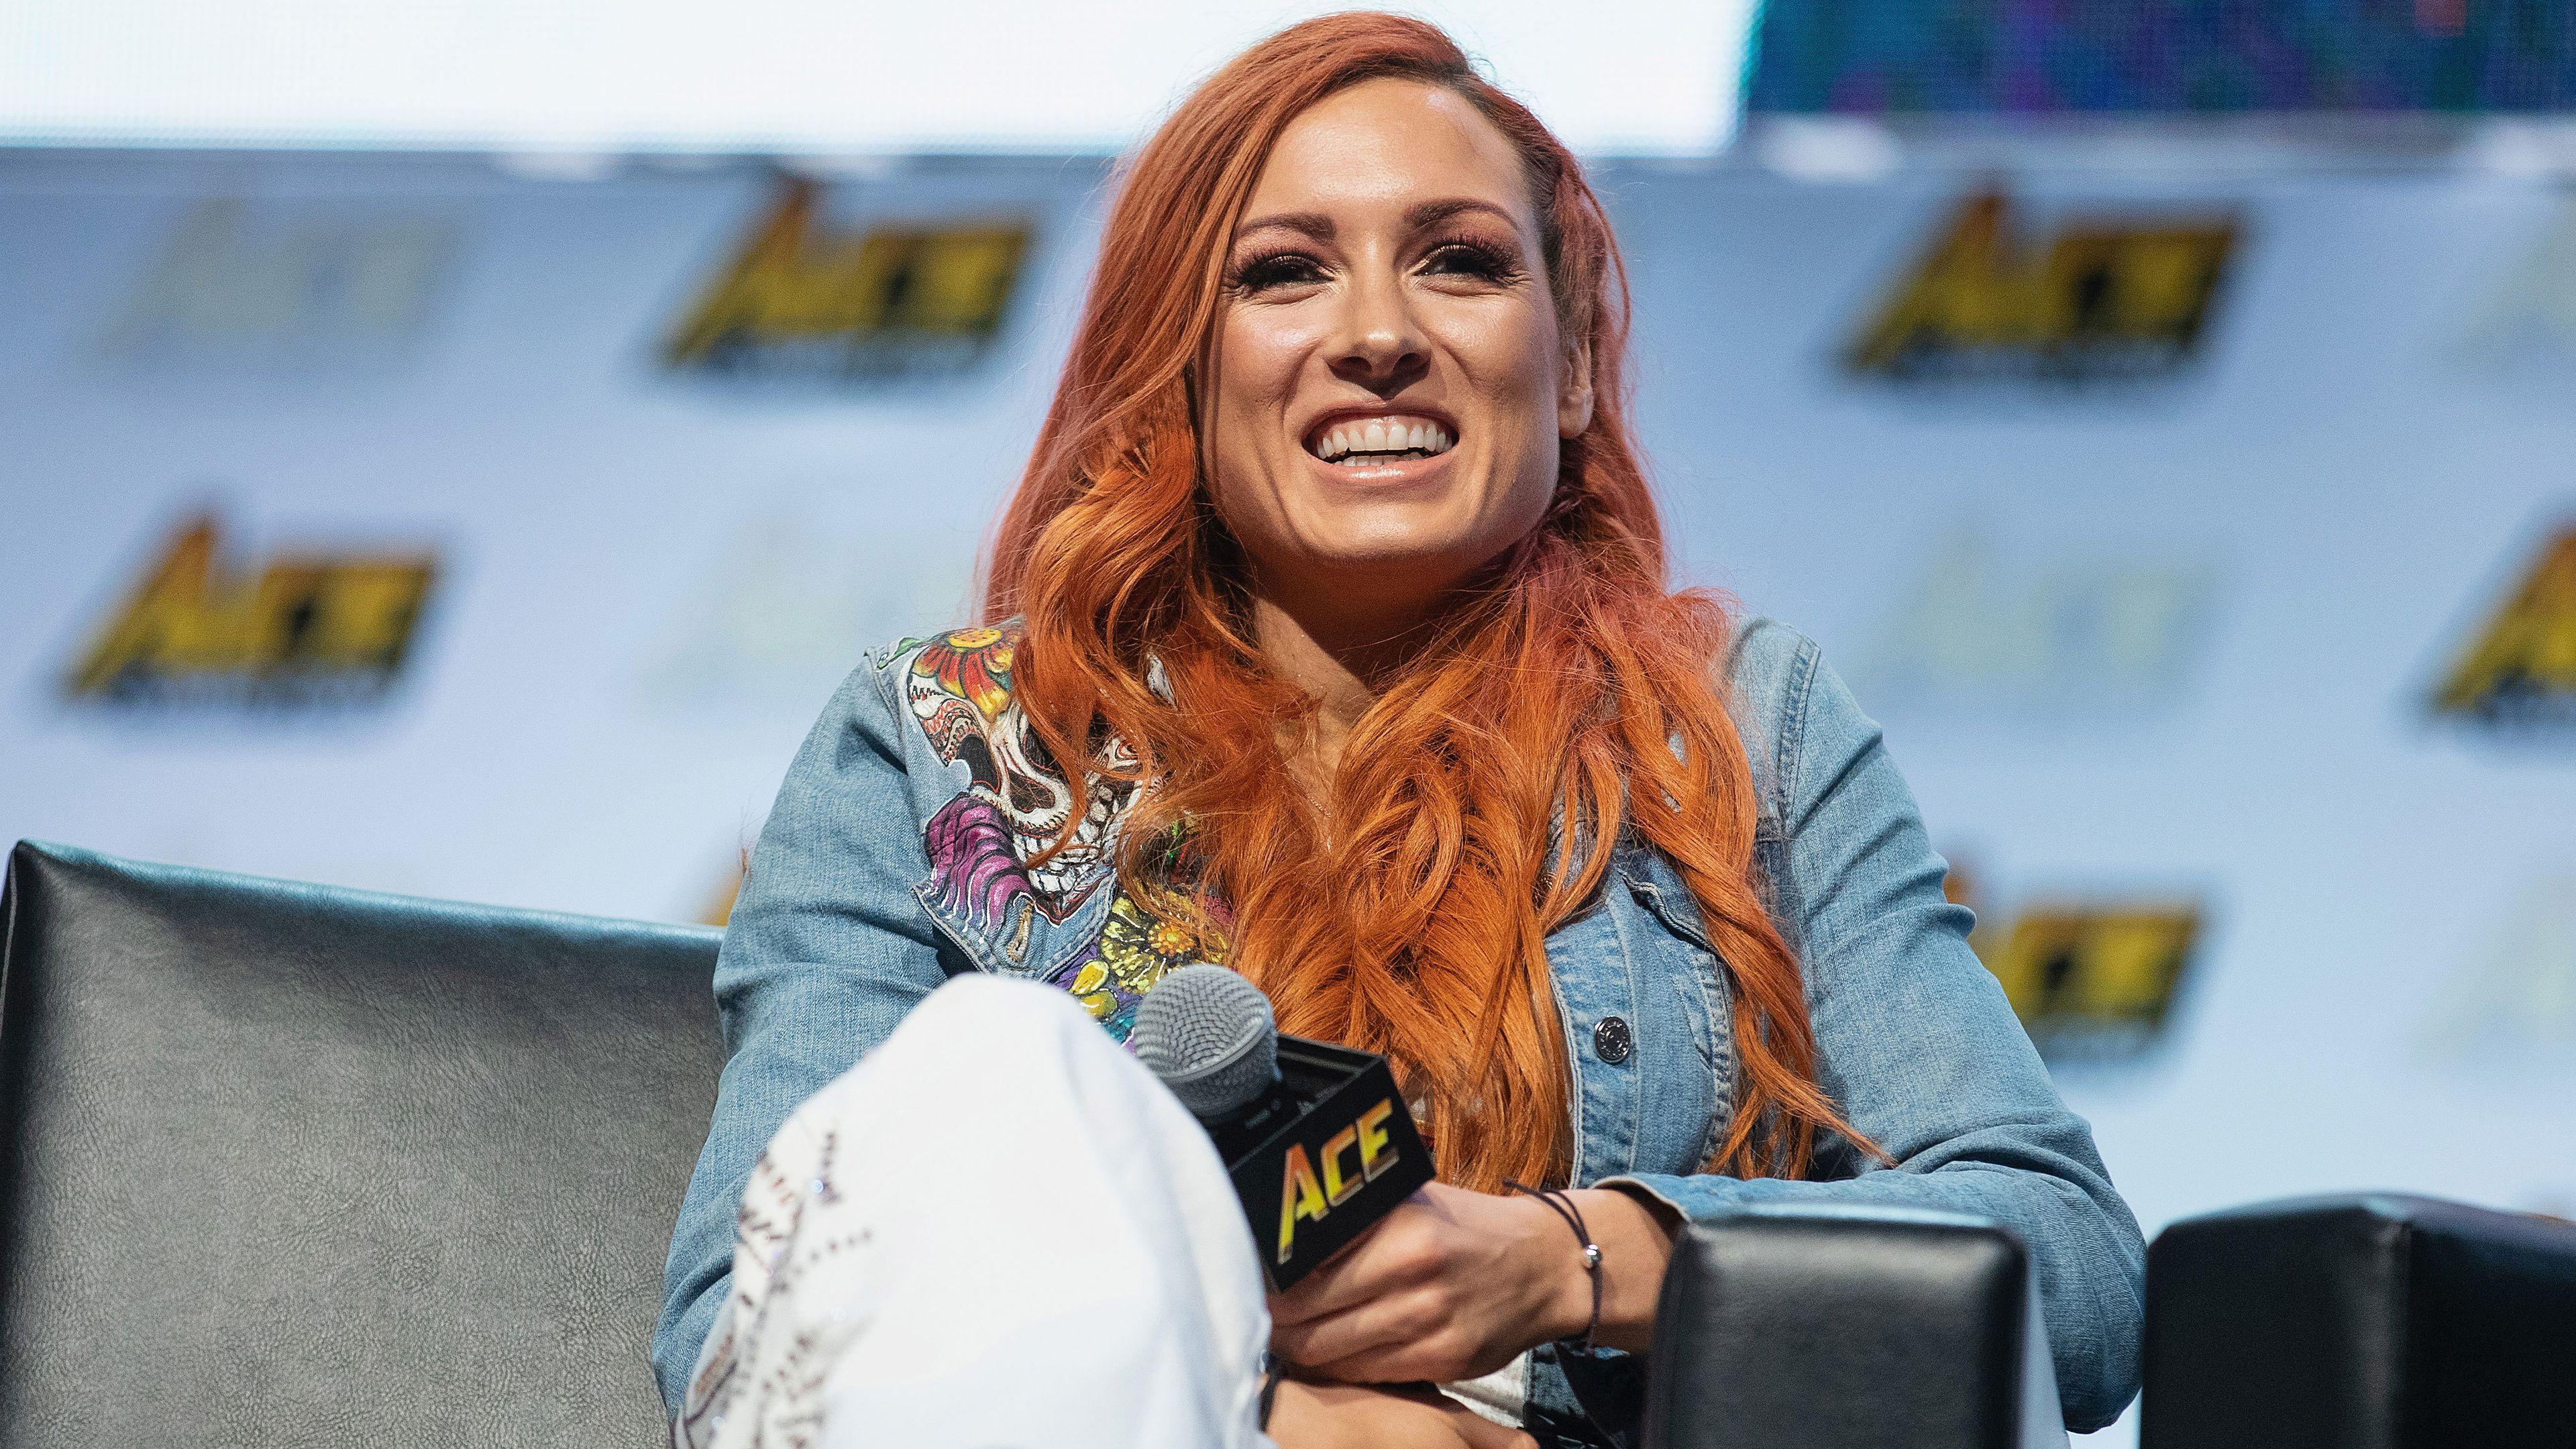 Exclusive: The fiery Irishwoman shaking up the WWE